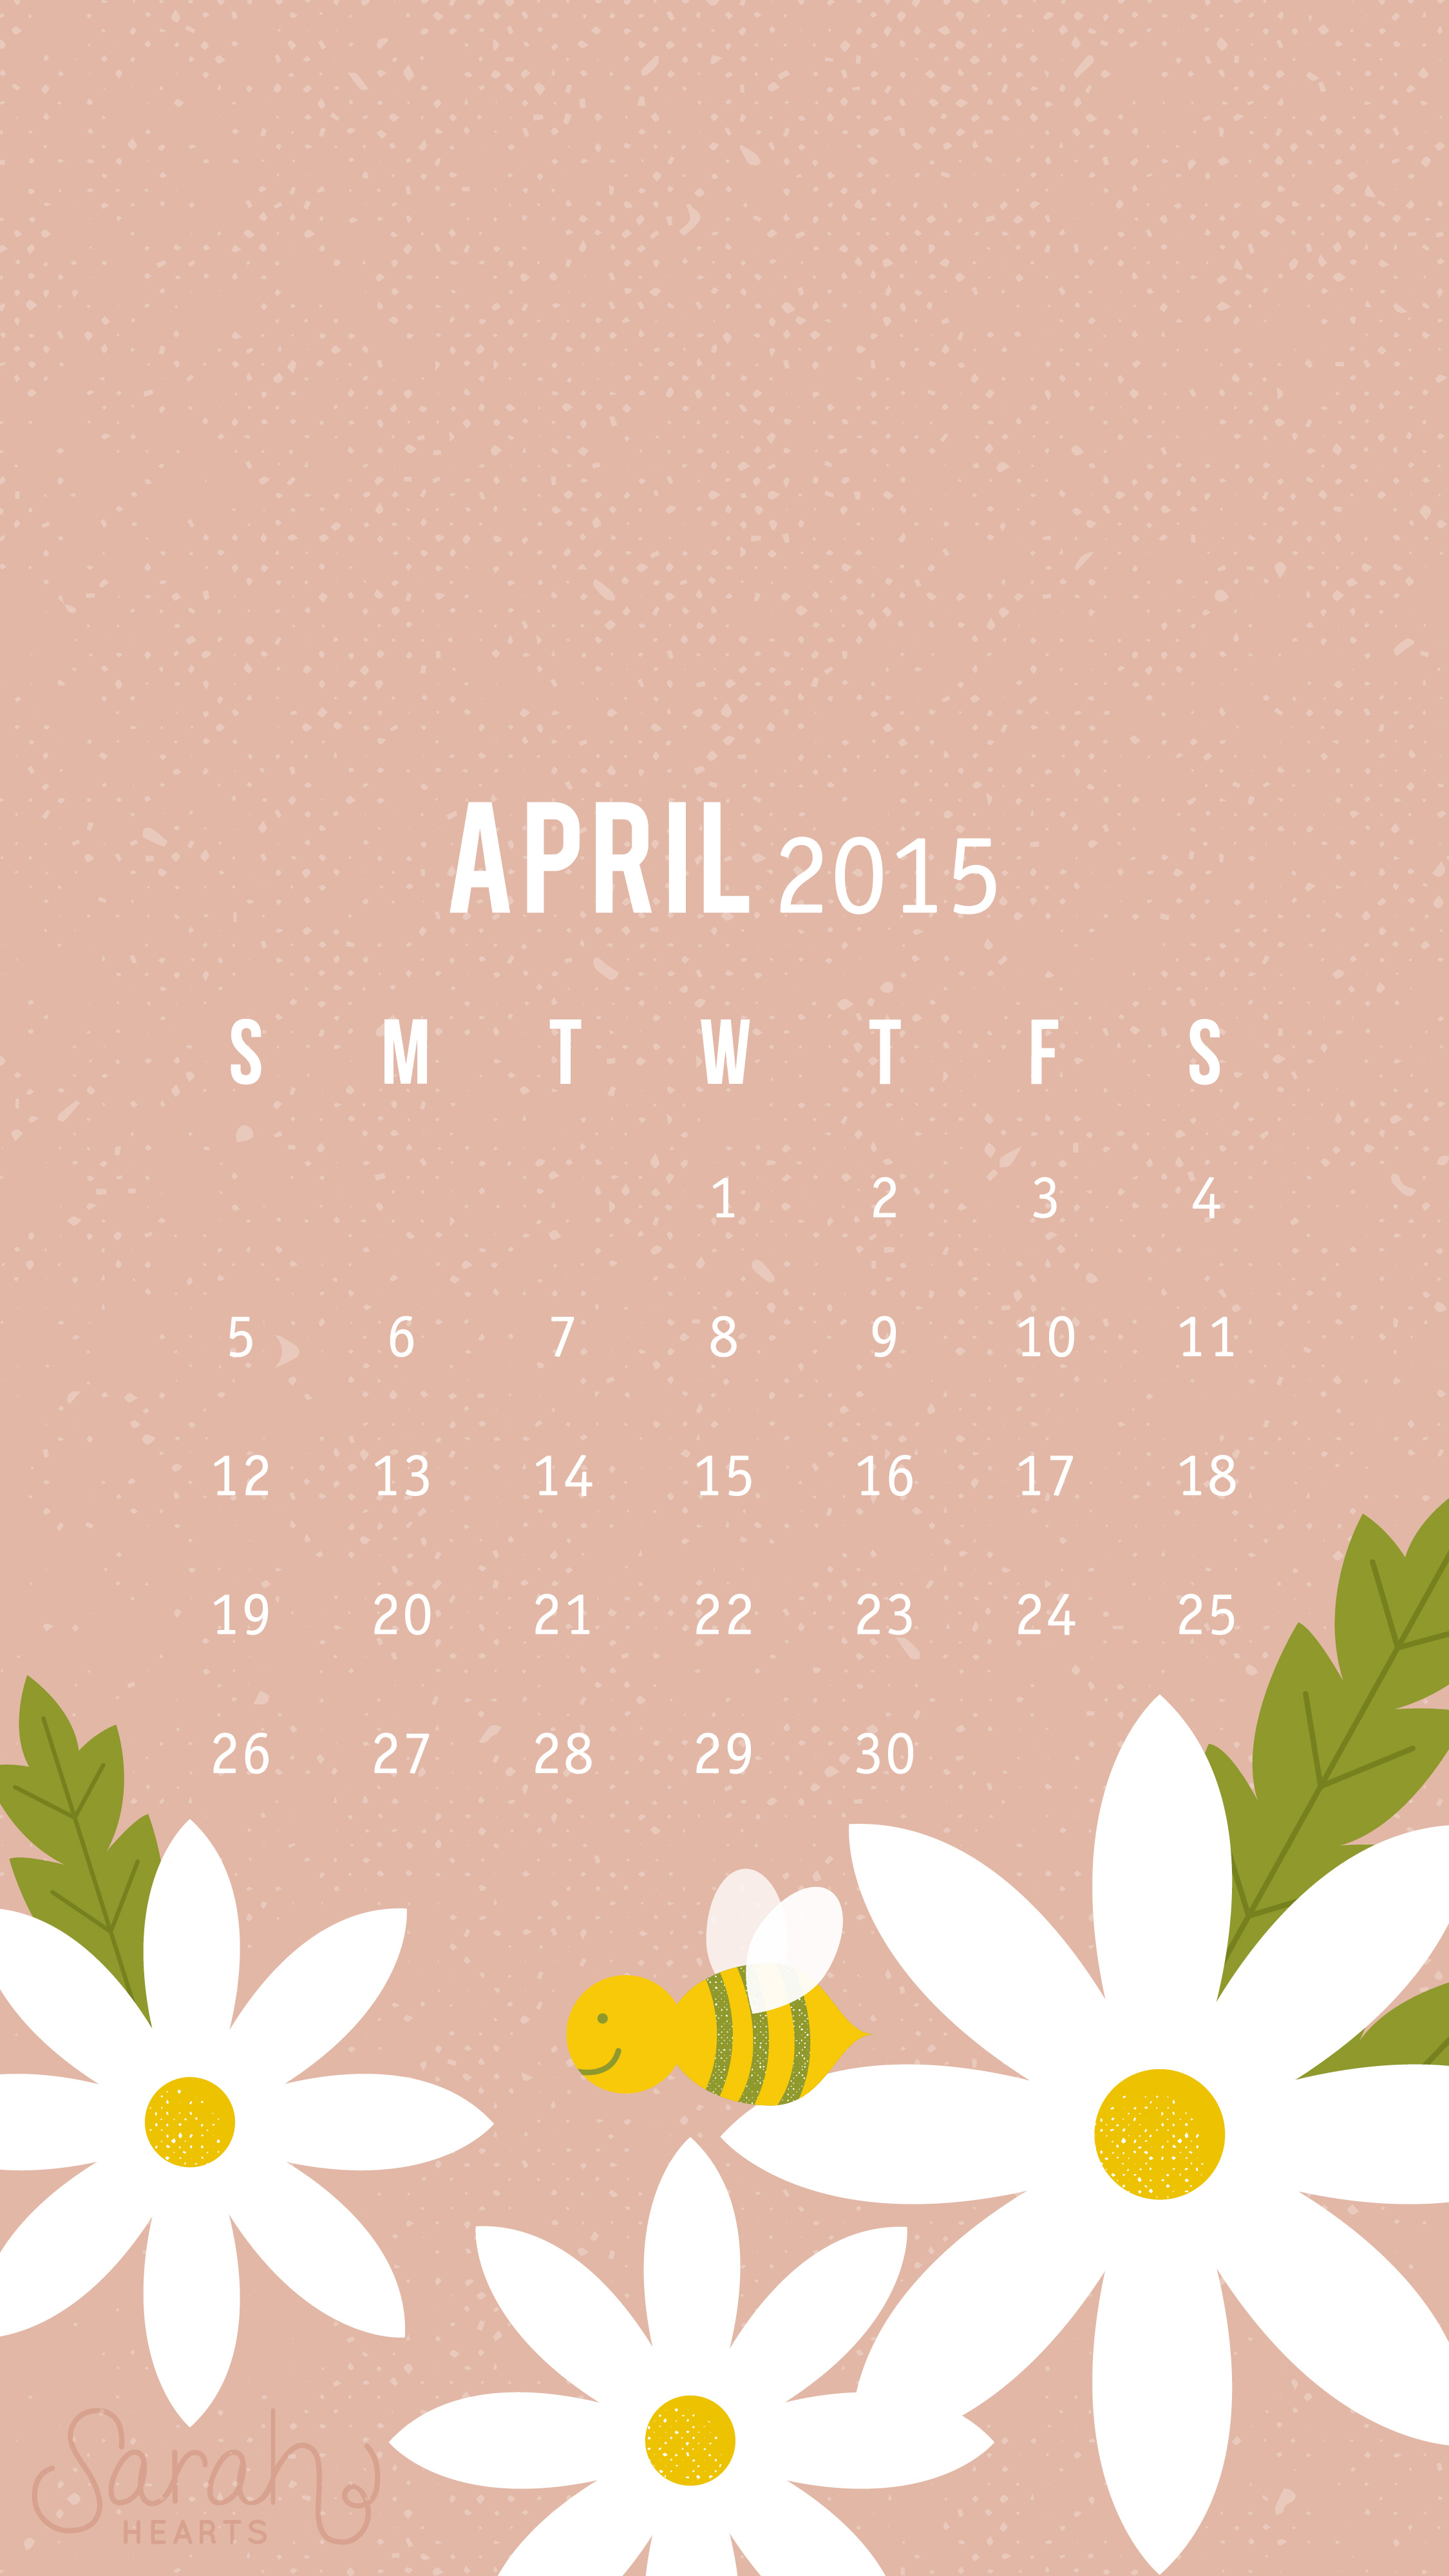 april 2015 calendar wallpaper - sarah hearts